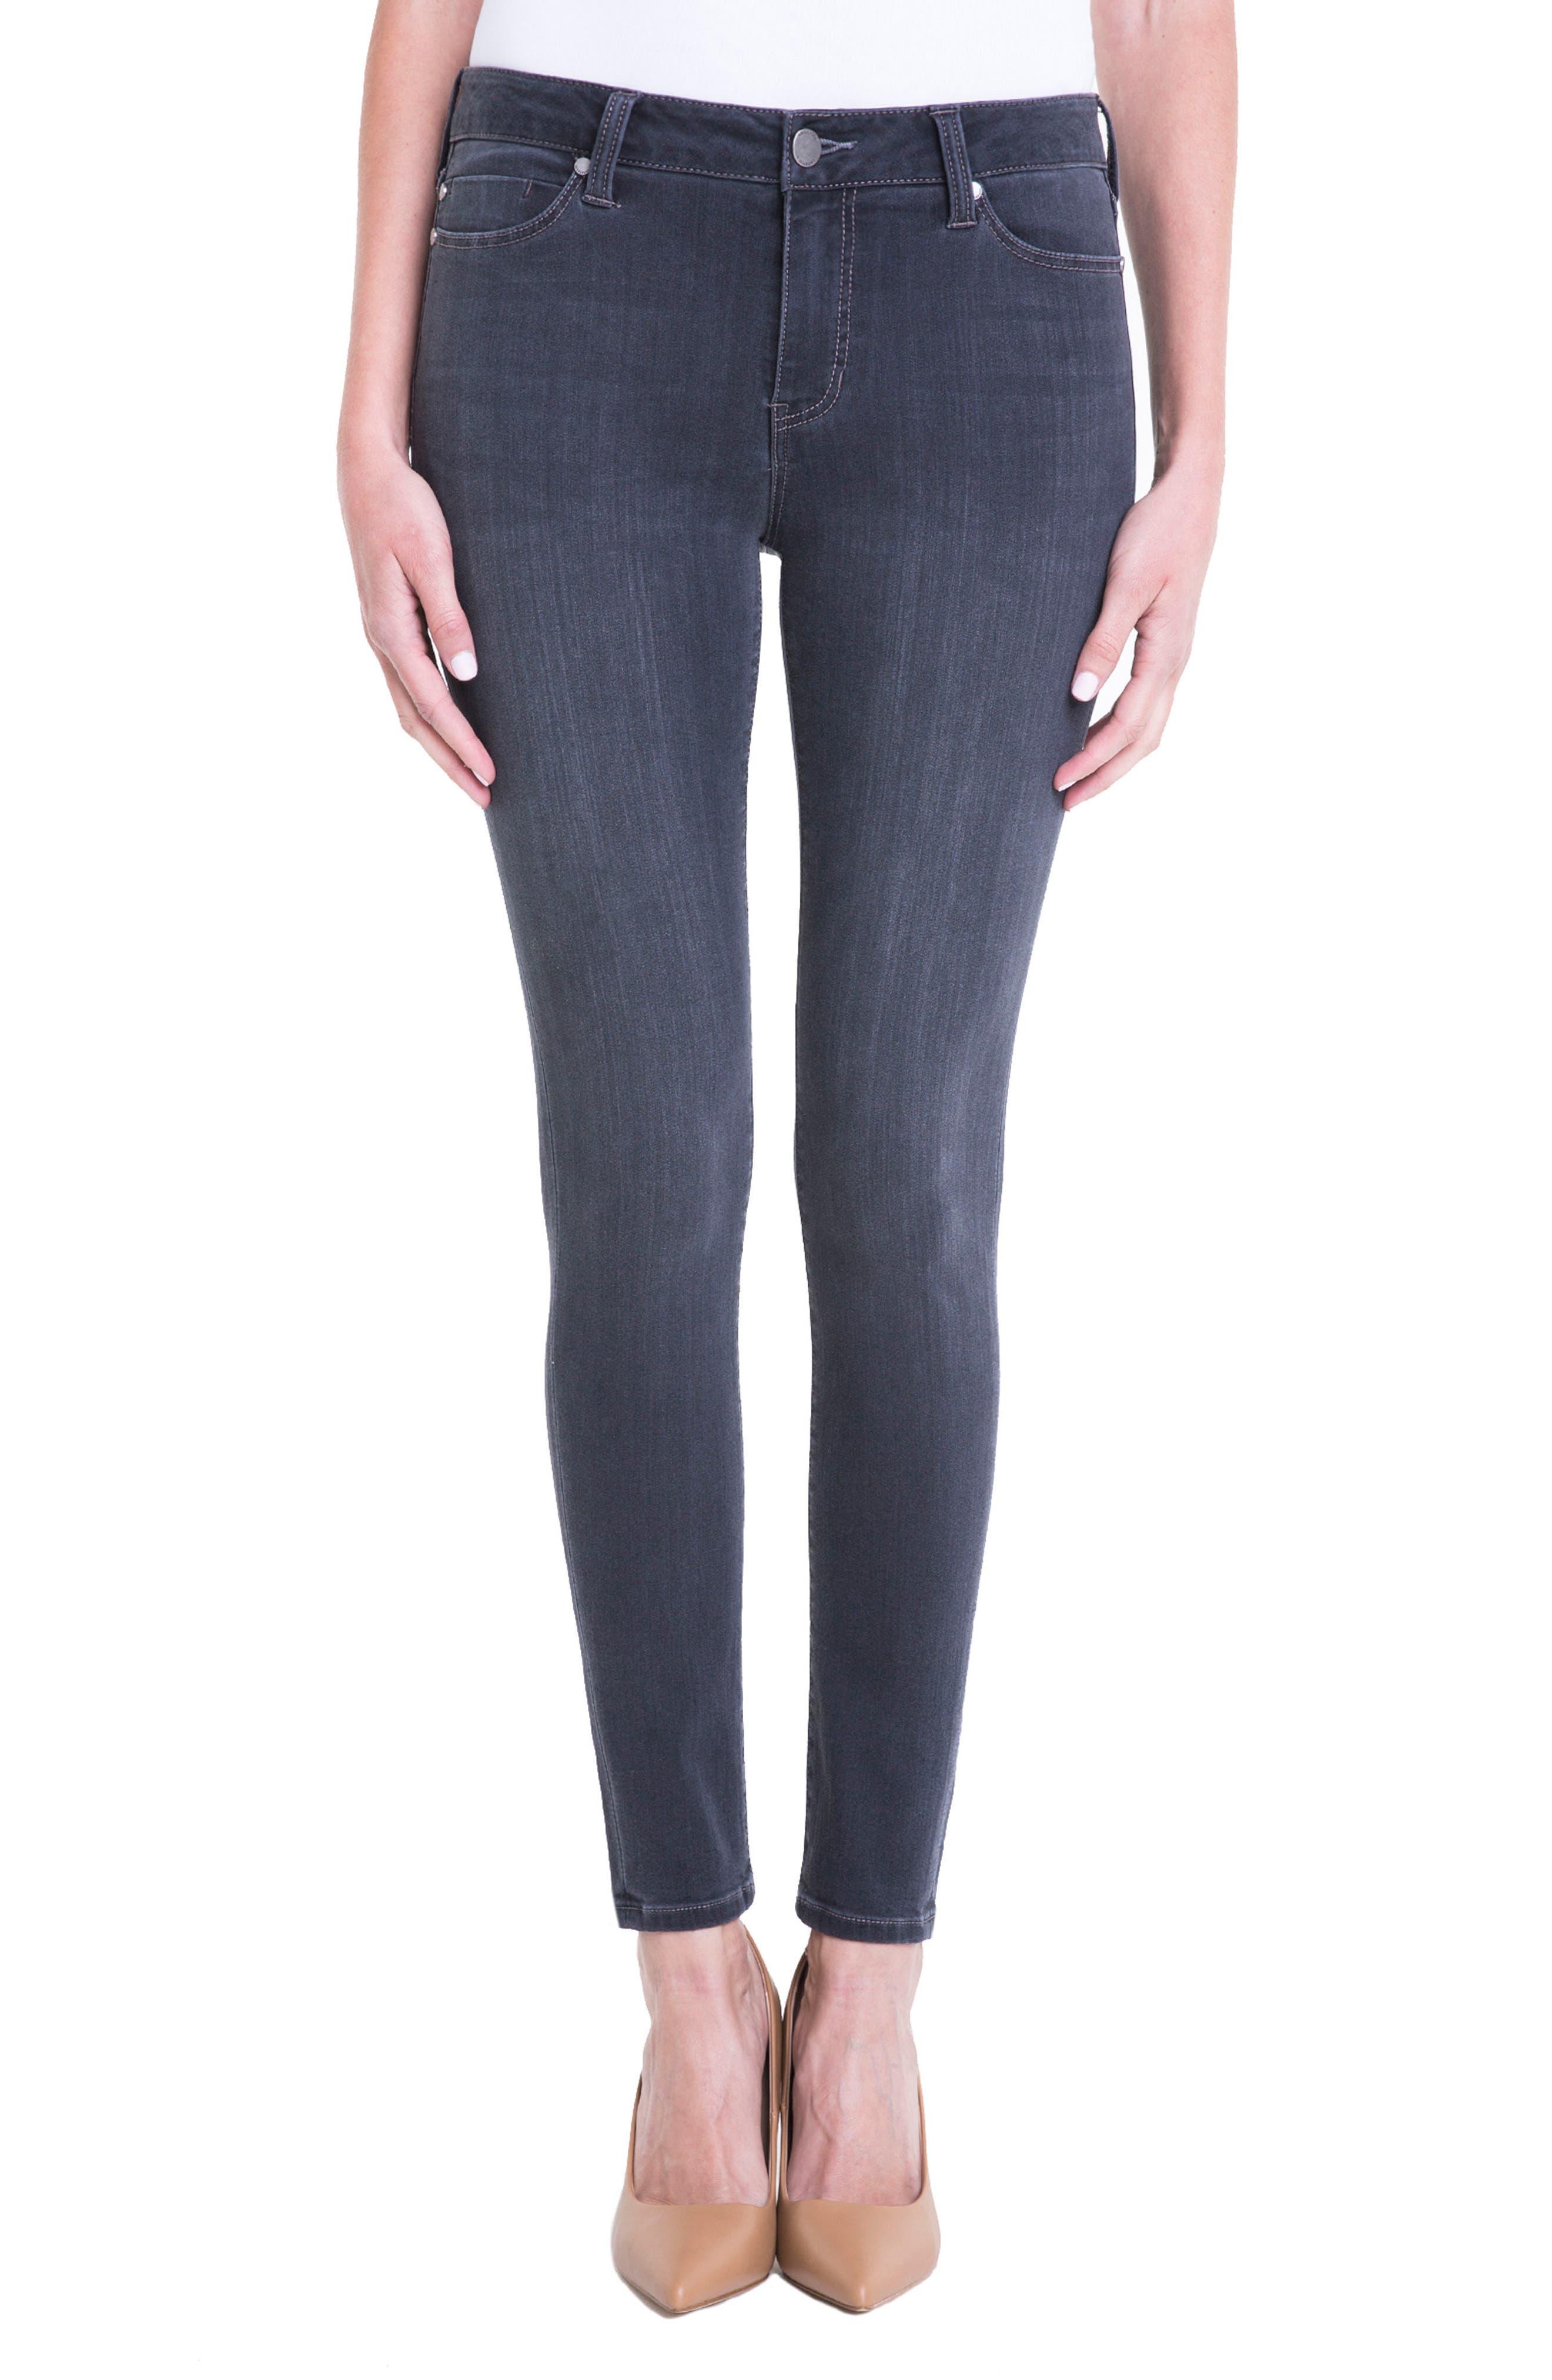 Women's Liverpool Jeans Company Abby Stretch Skinny Jeans